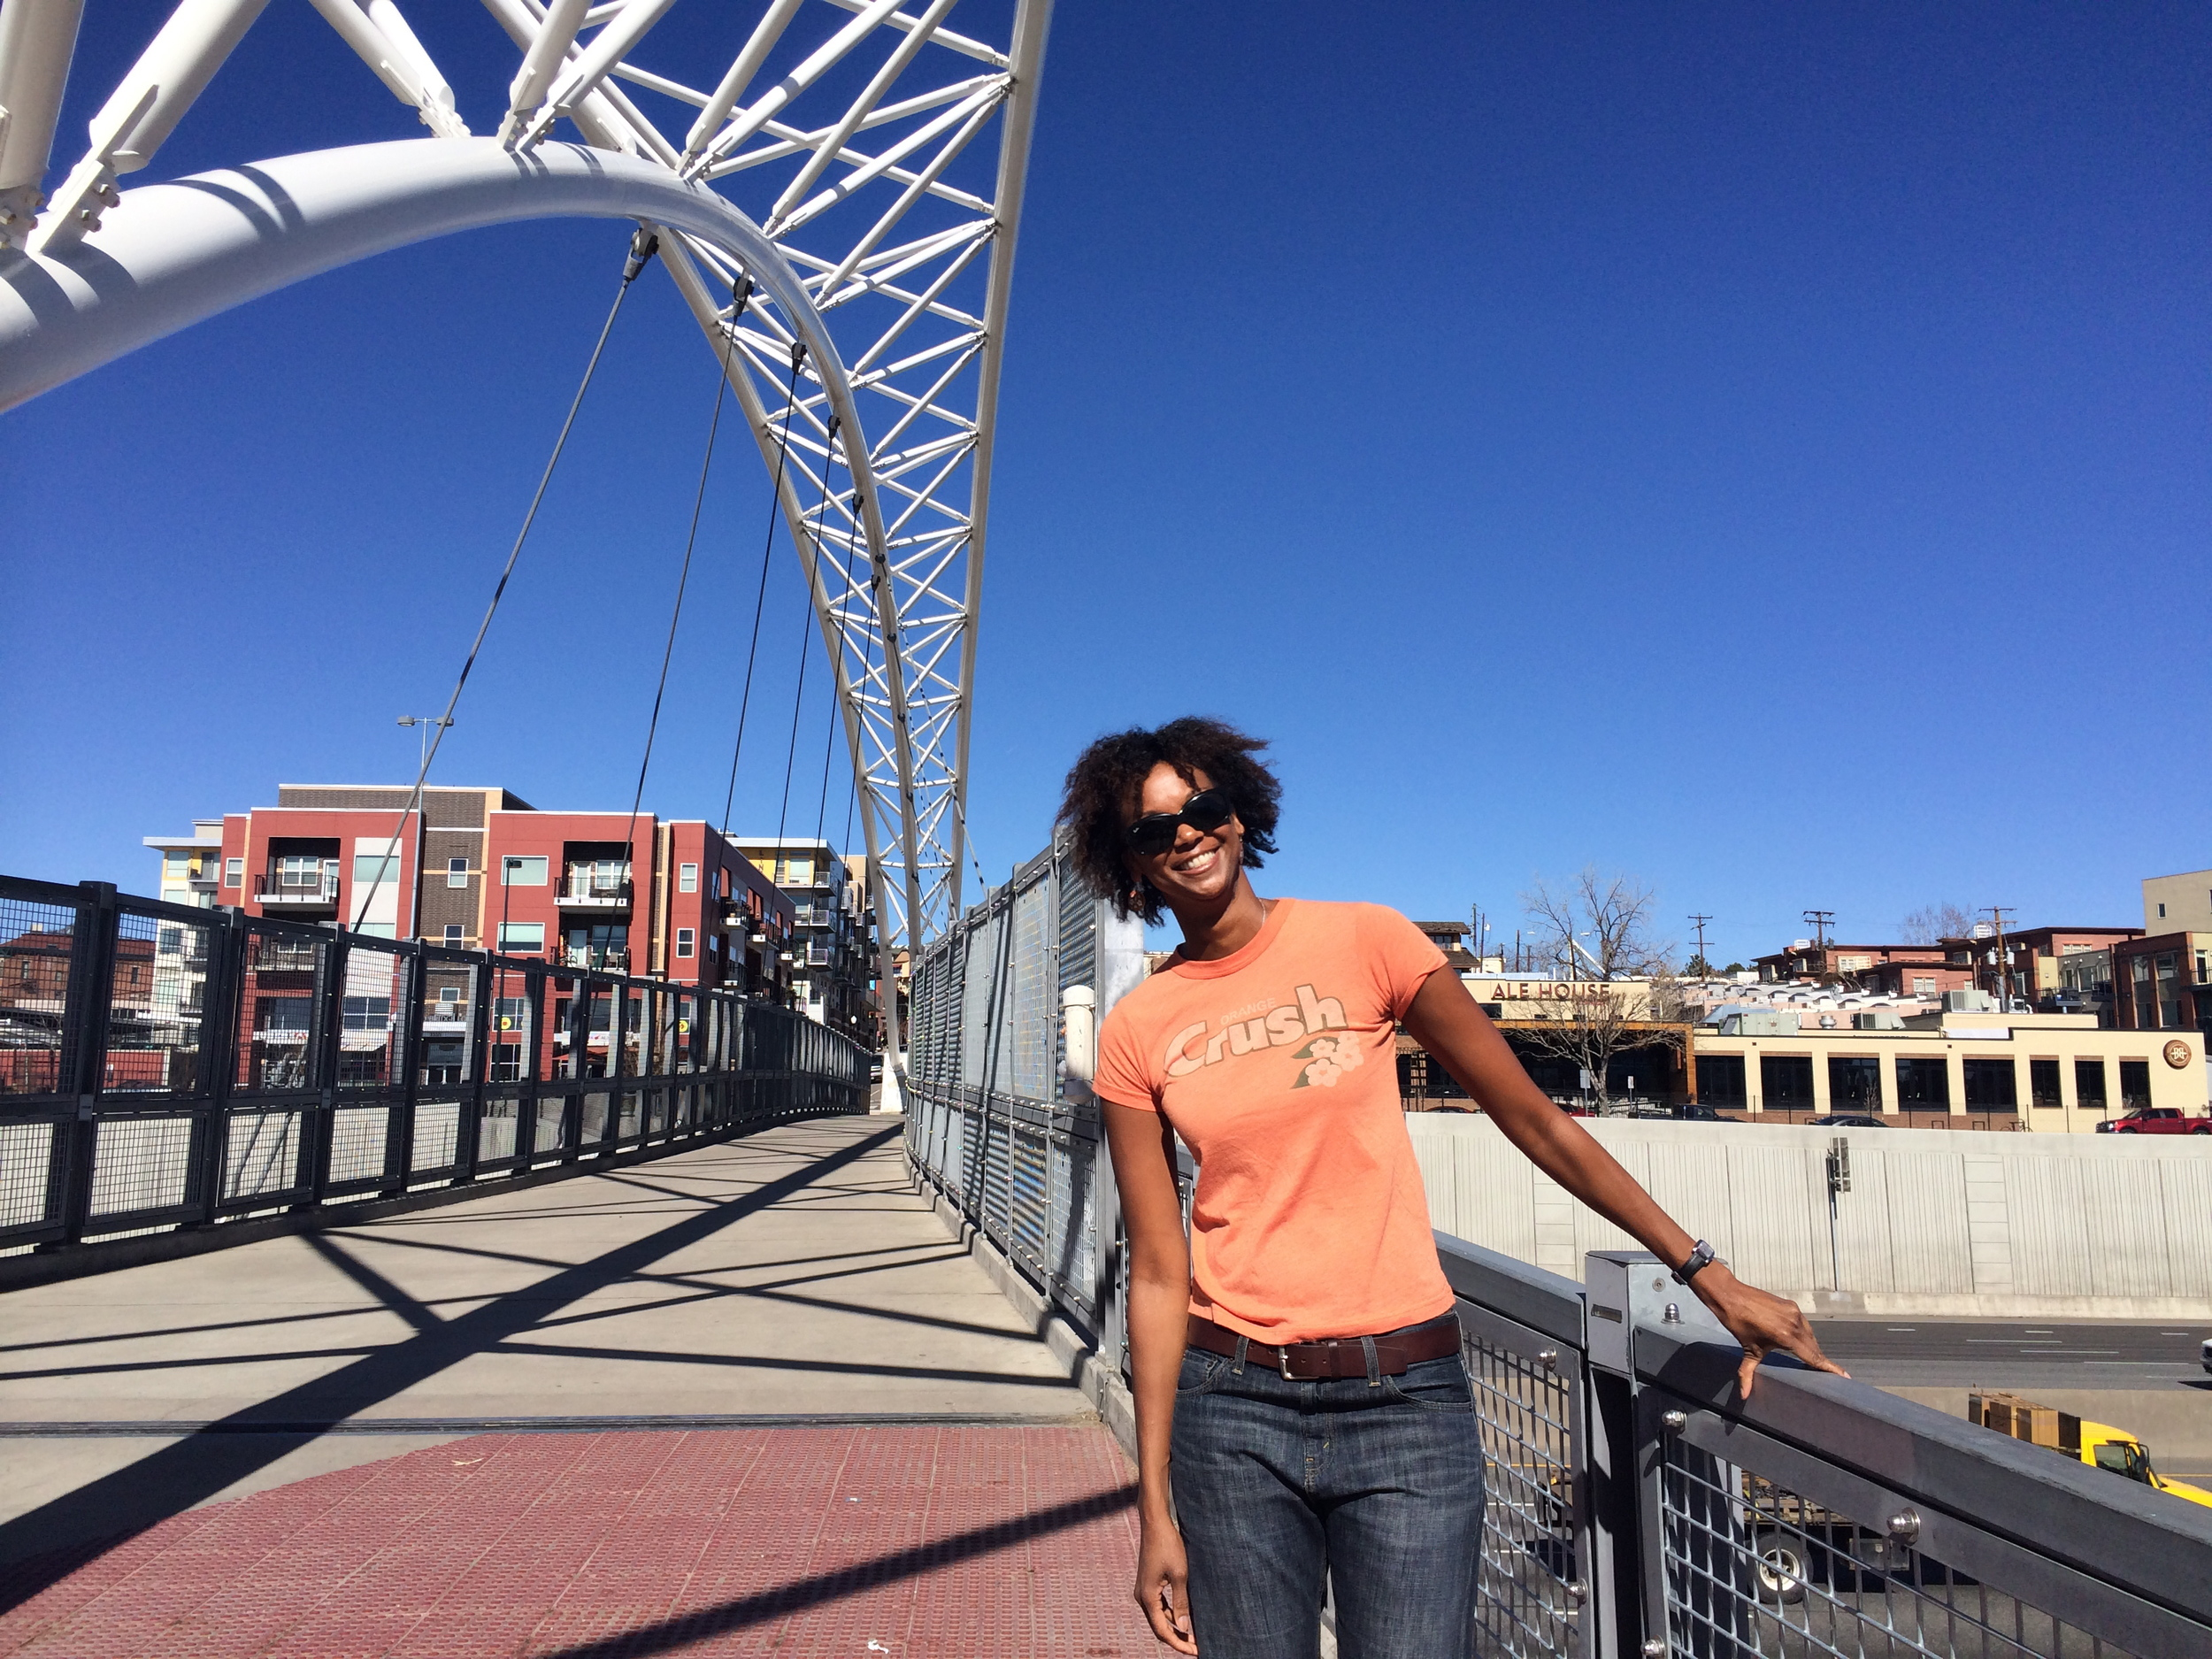 Having a perfectly fine hair day a few weeks ago in Denver.